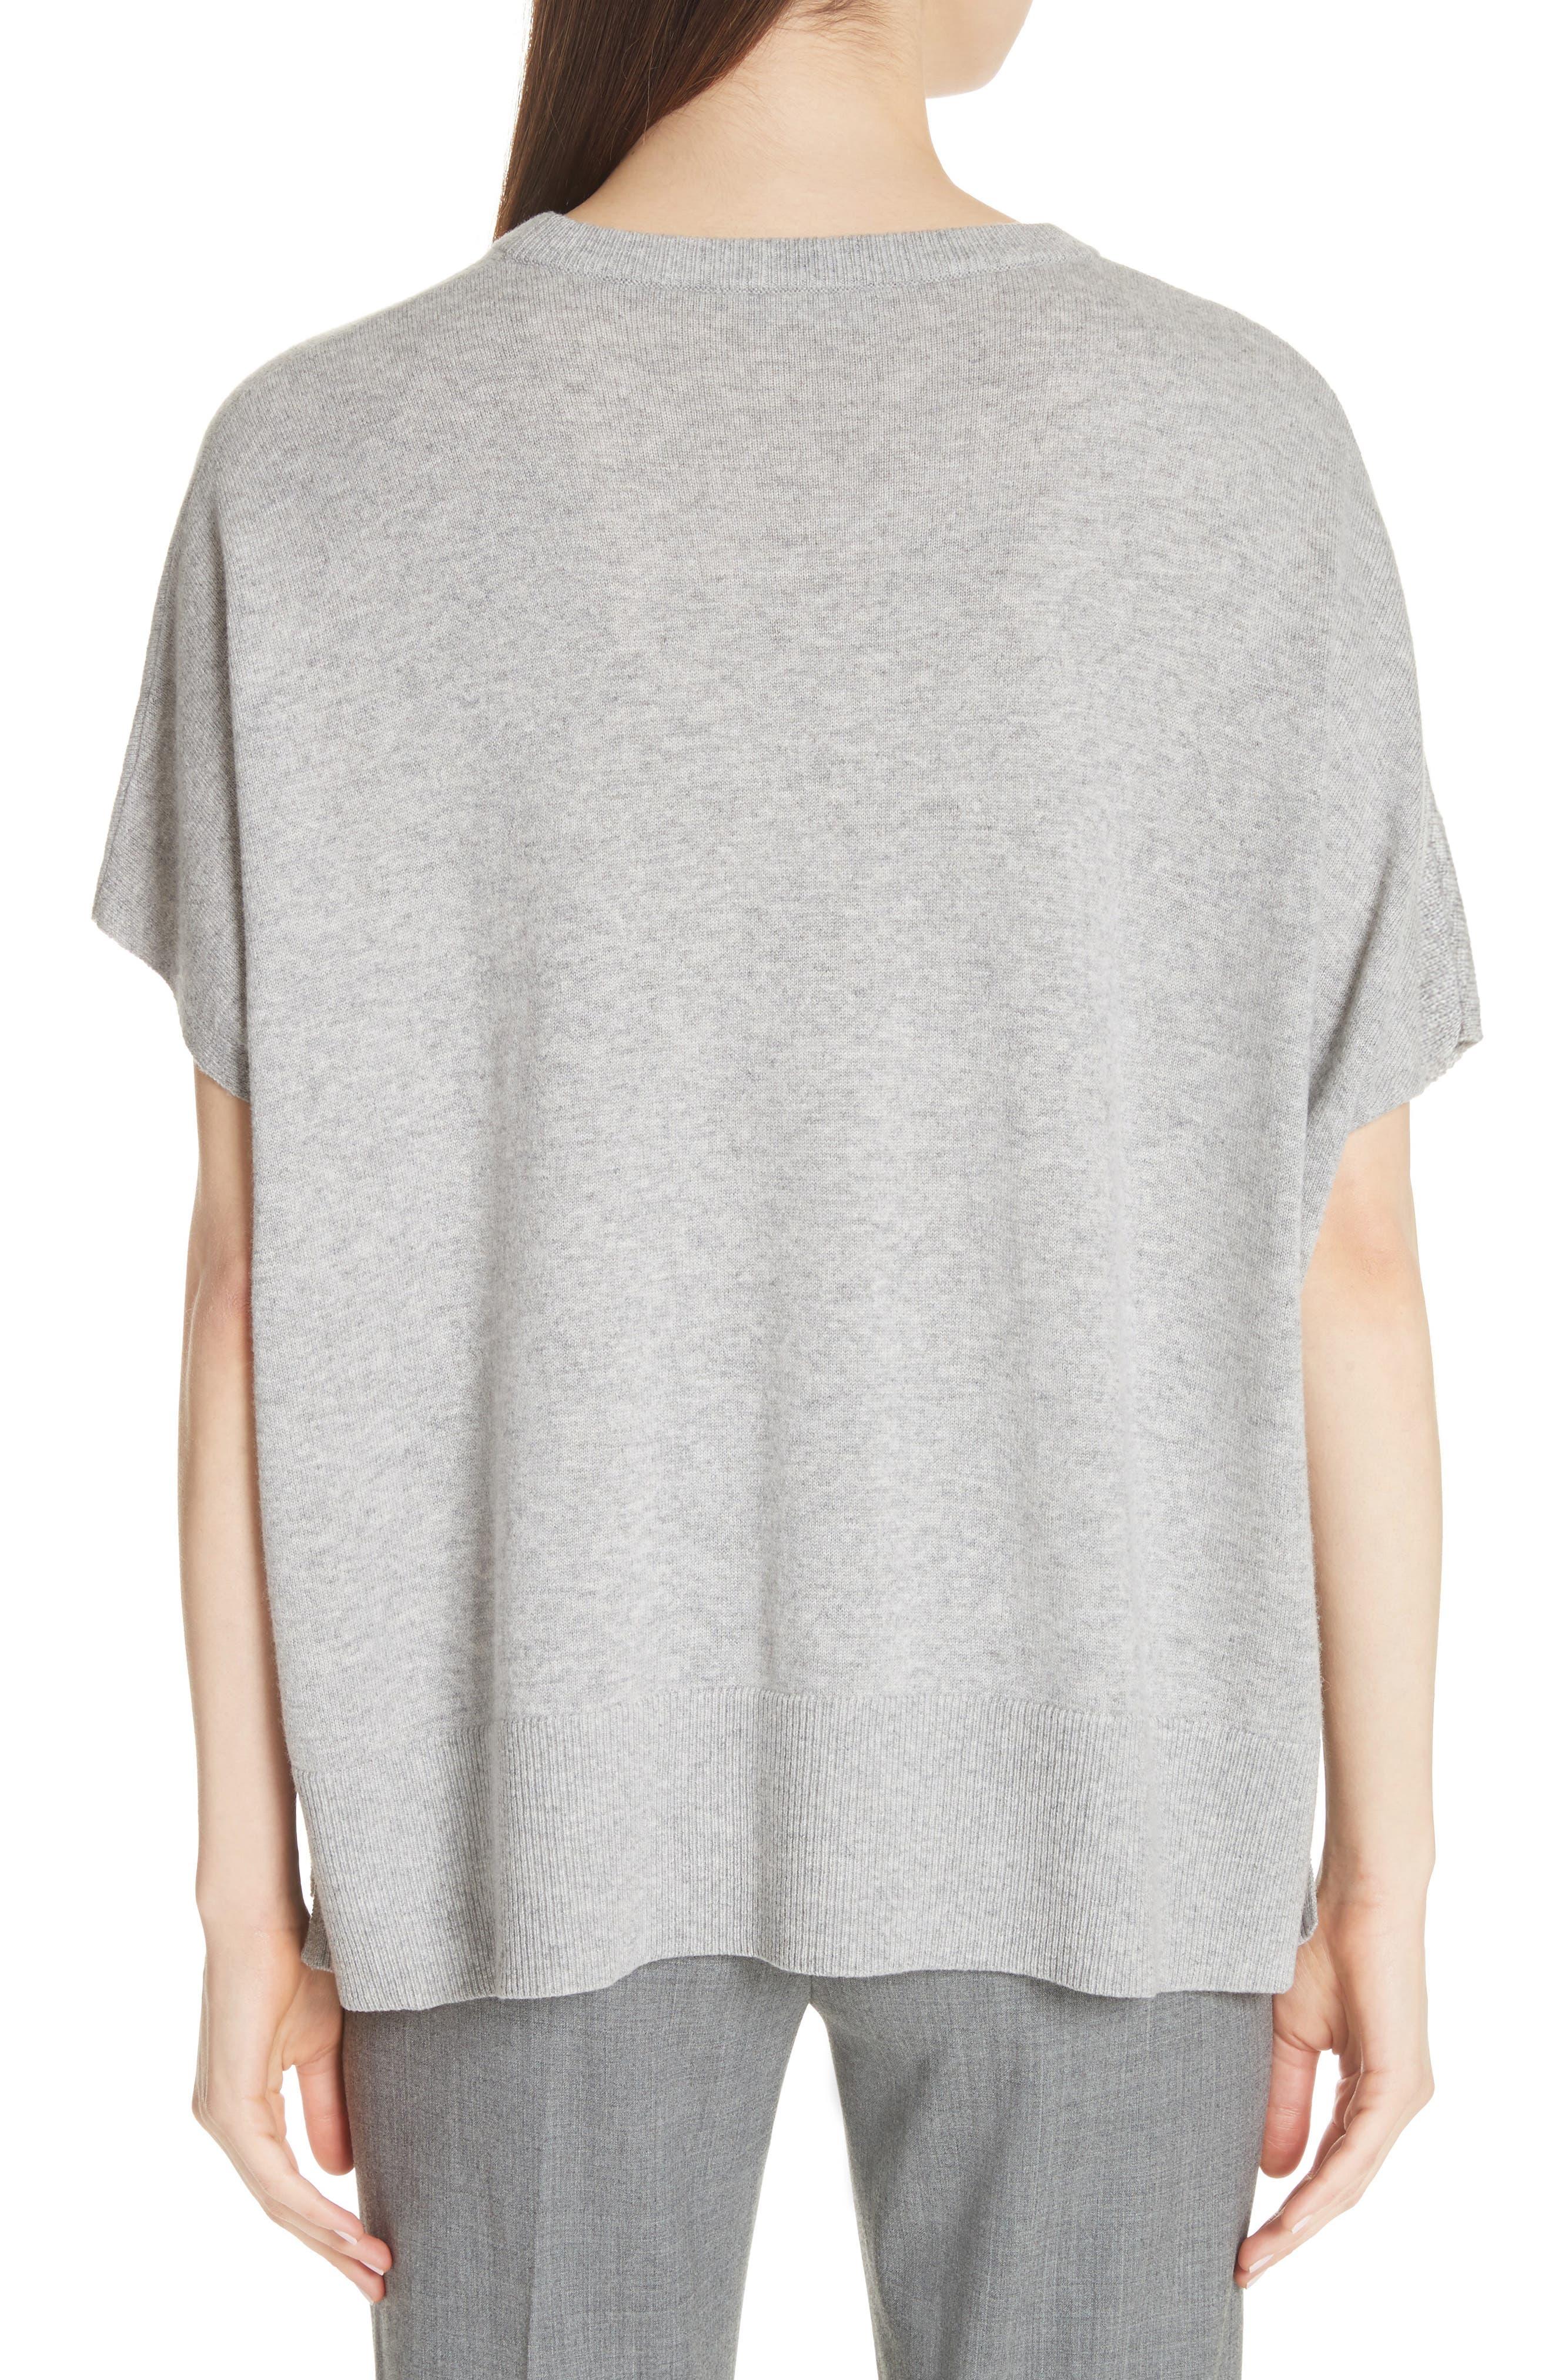 Cashmere Draped Pullover,                             Alternate thumbnail 2, color,                             PEARL GREY MELANGE